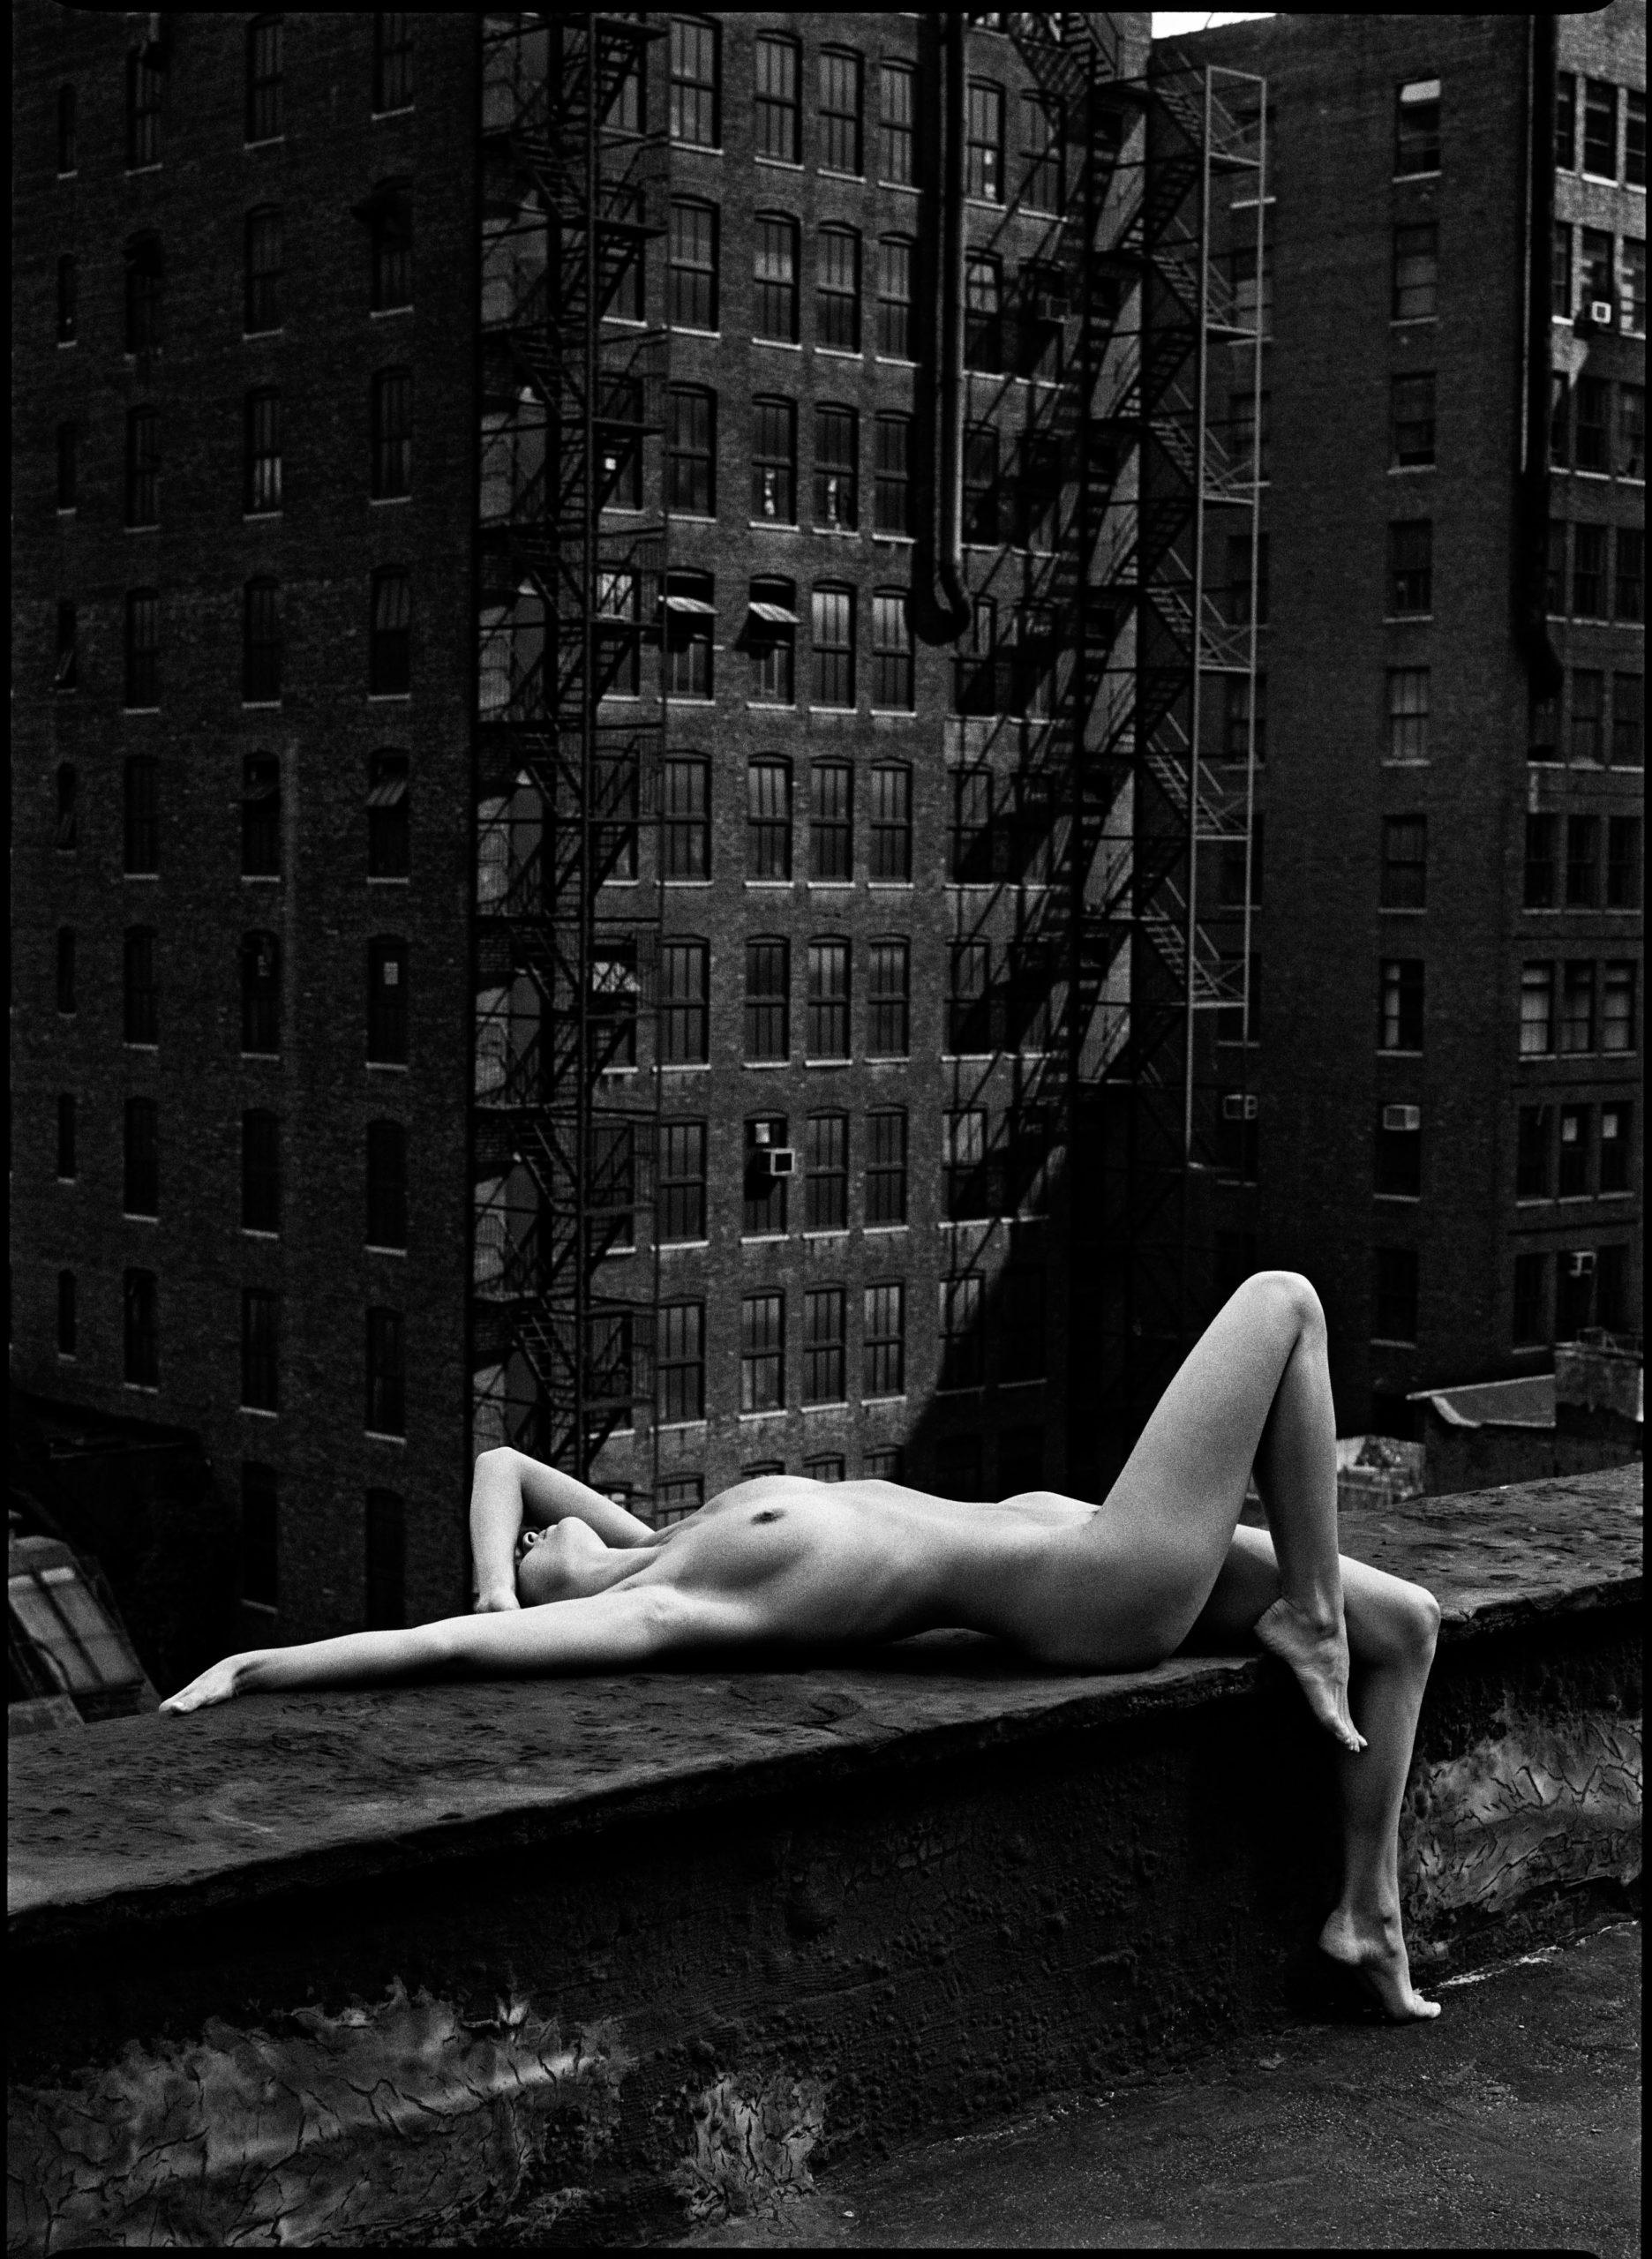 Nude, New York